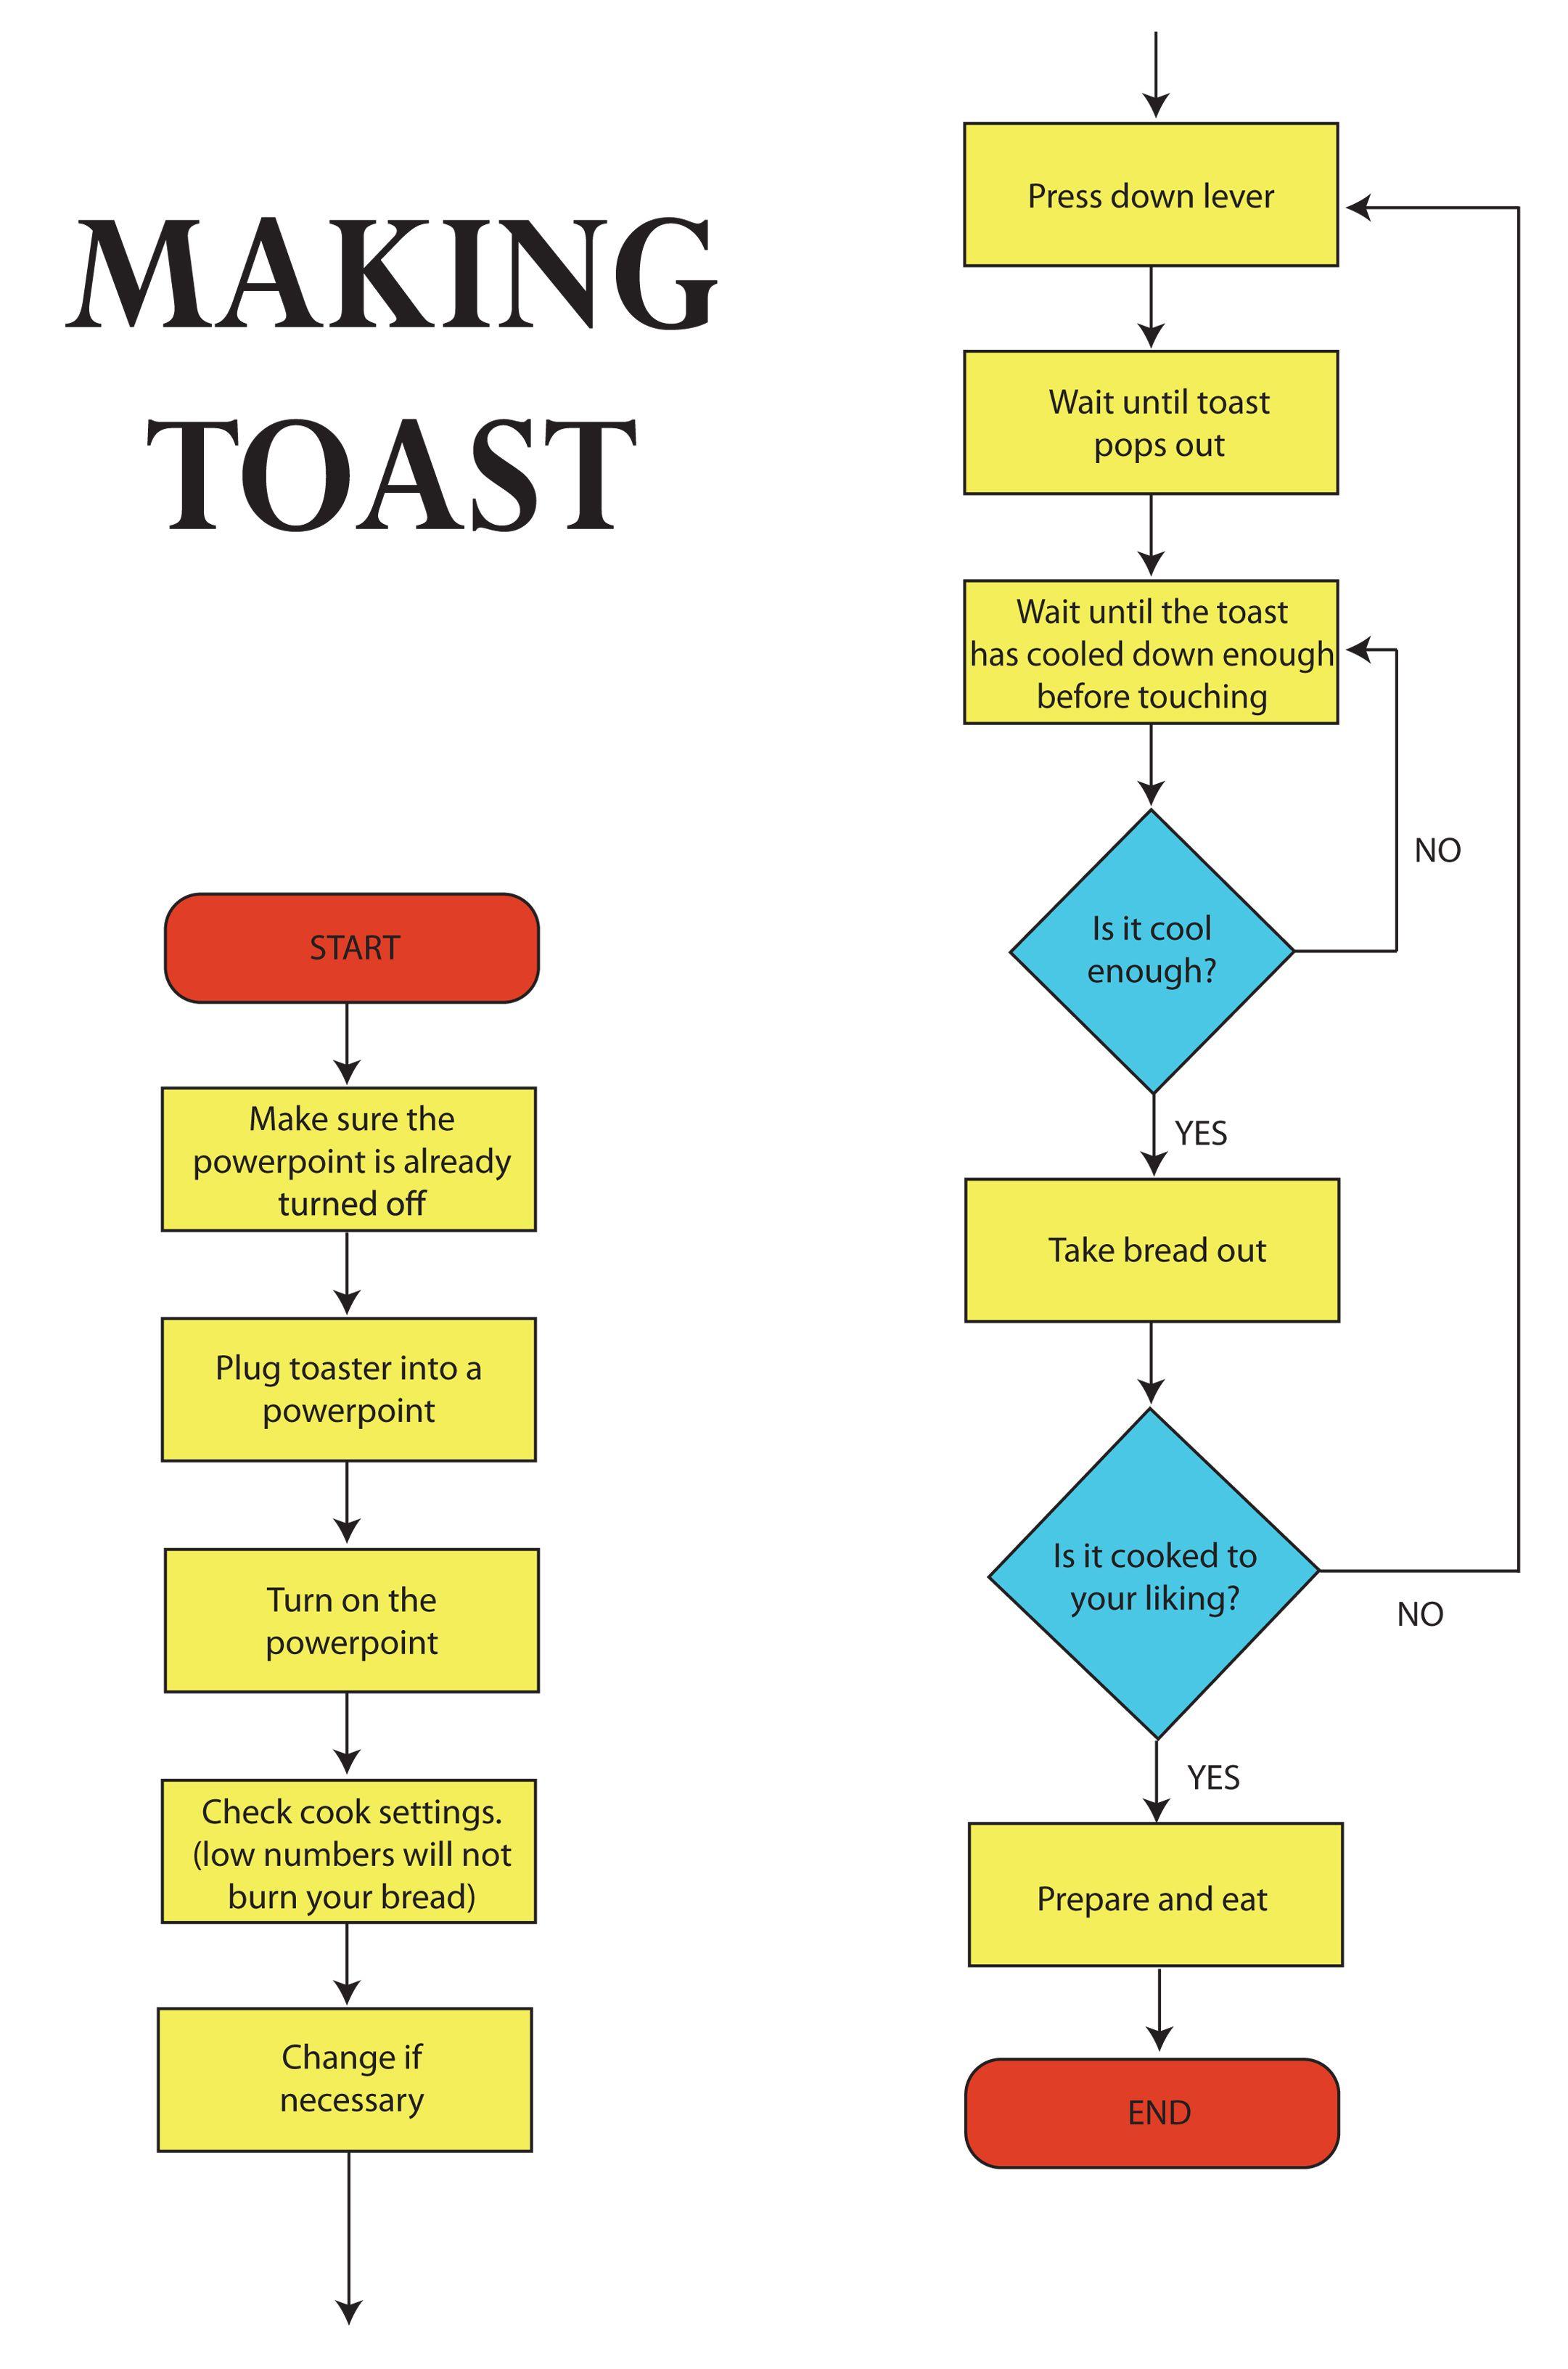 Making toast flowchartg 21613264 flowcharts pinterest making toast flowchartg 21613264 nvjuhfo Choice Image